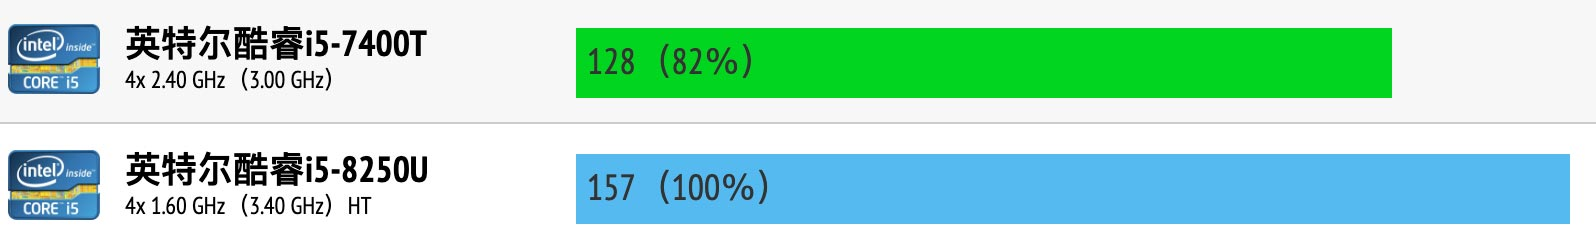 Intel Core i5-7400T和i5-8250U性能跑分对比评测